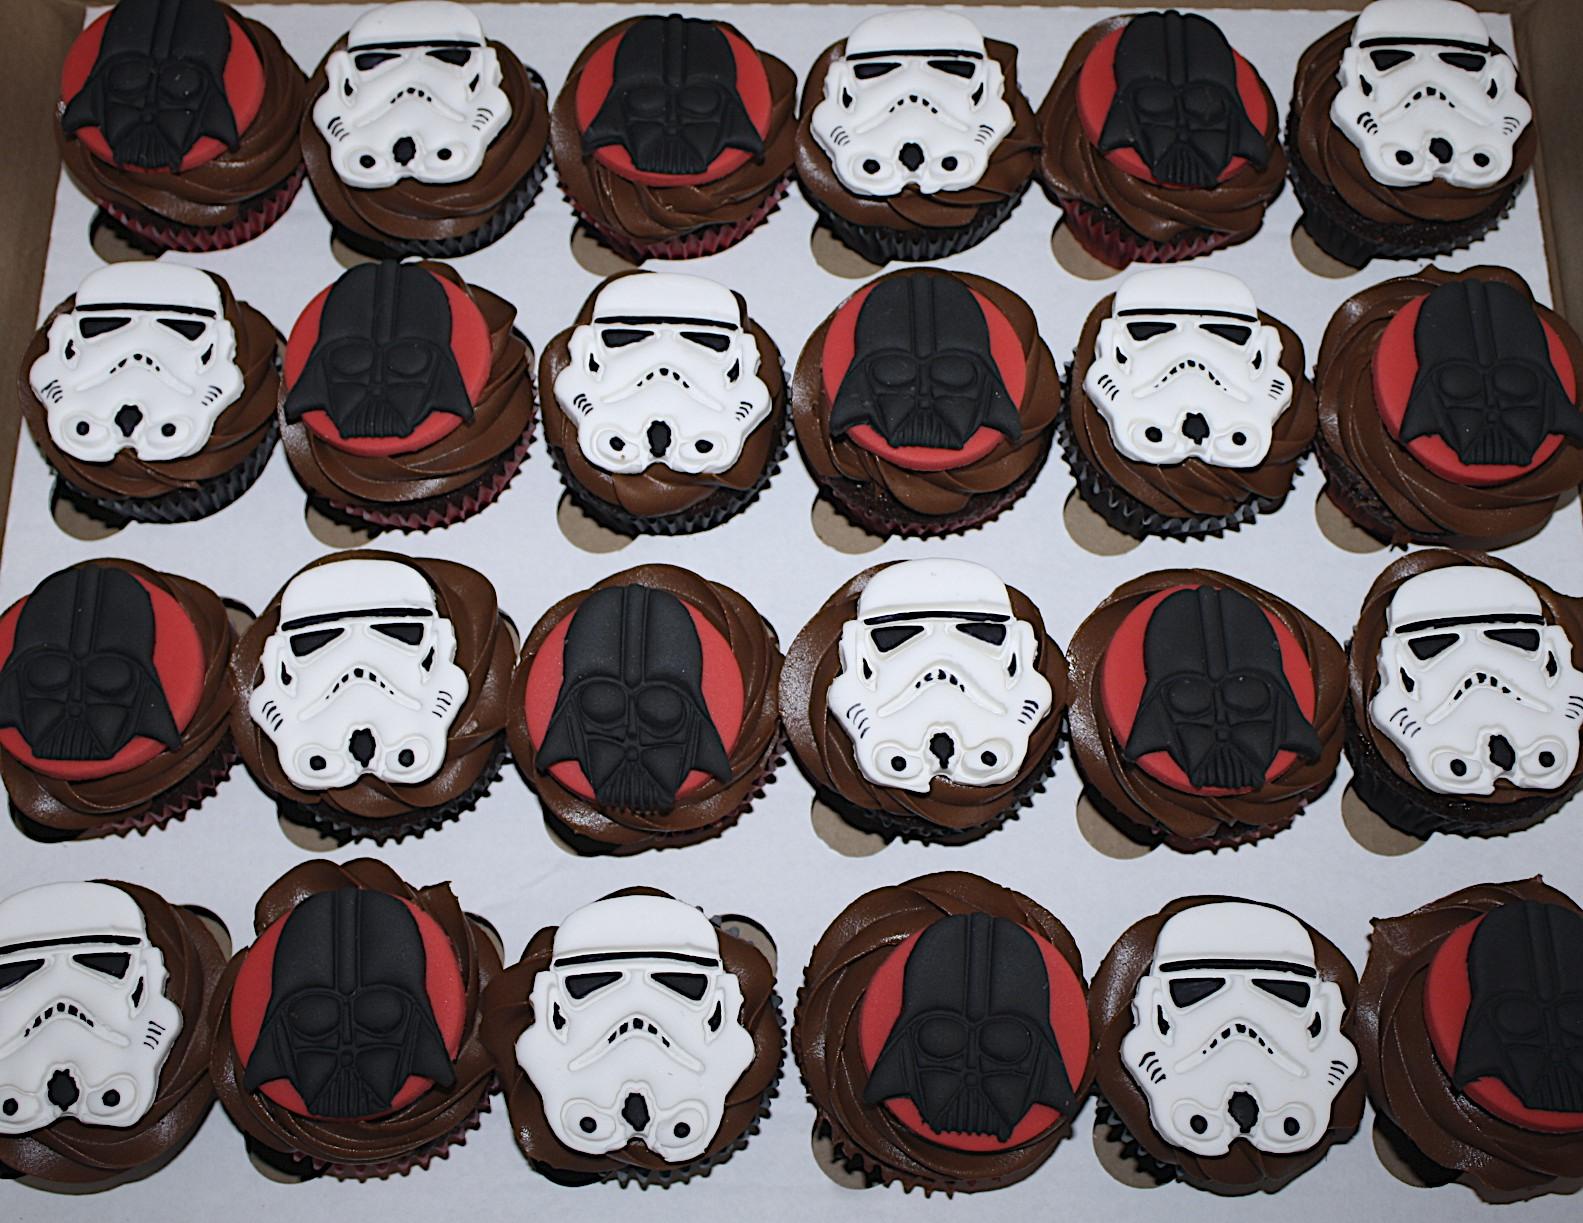 Storm Trouper & Darth Vadar Cupcakes